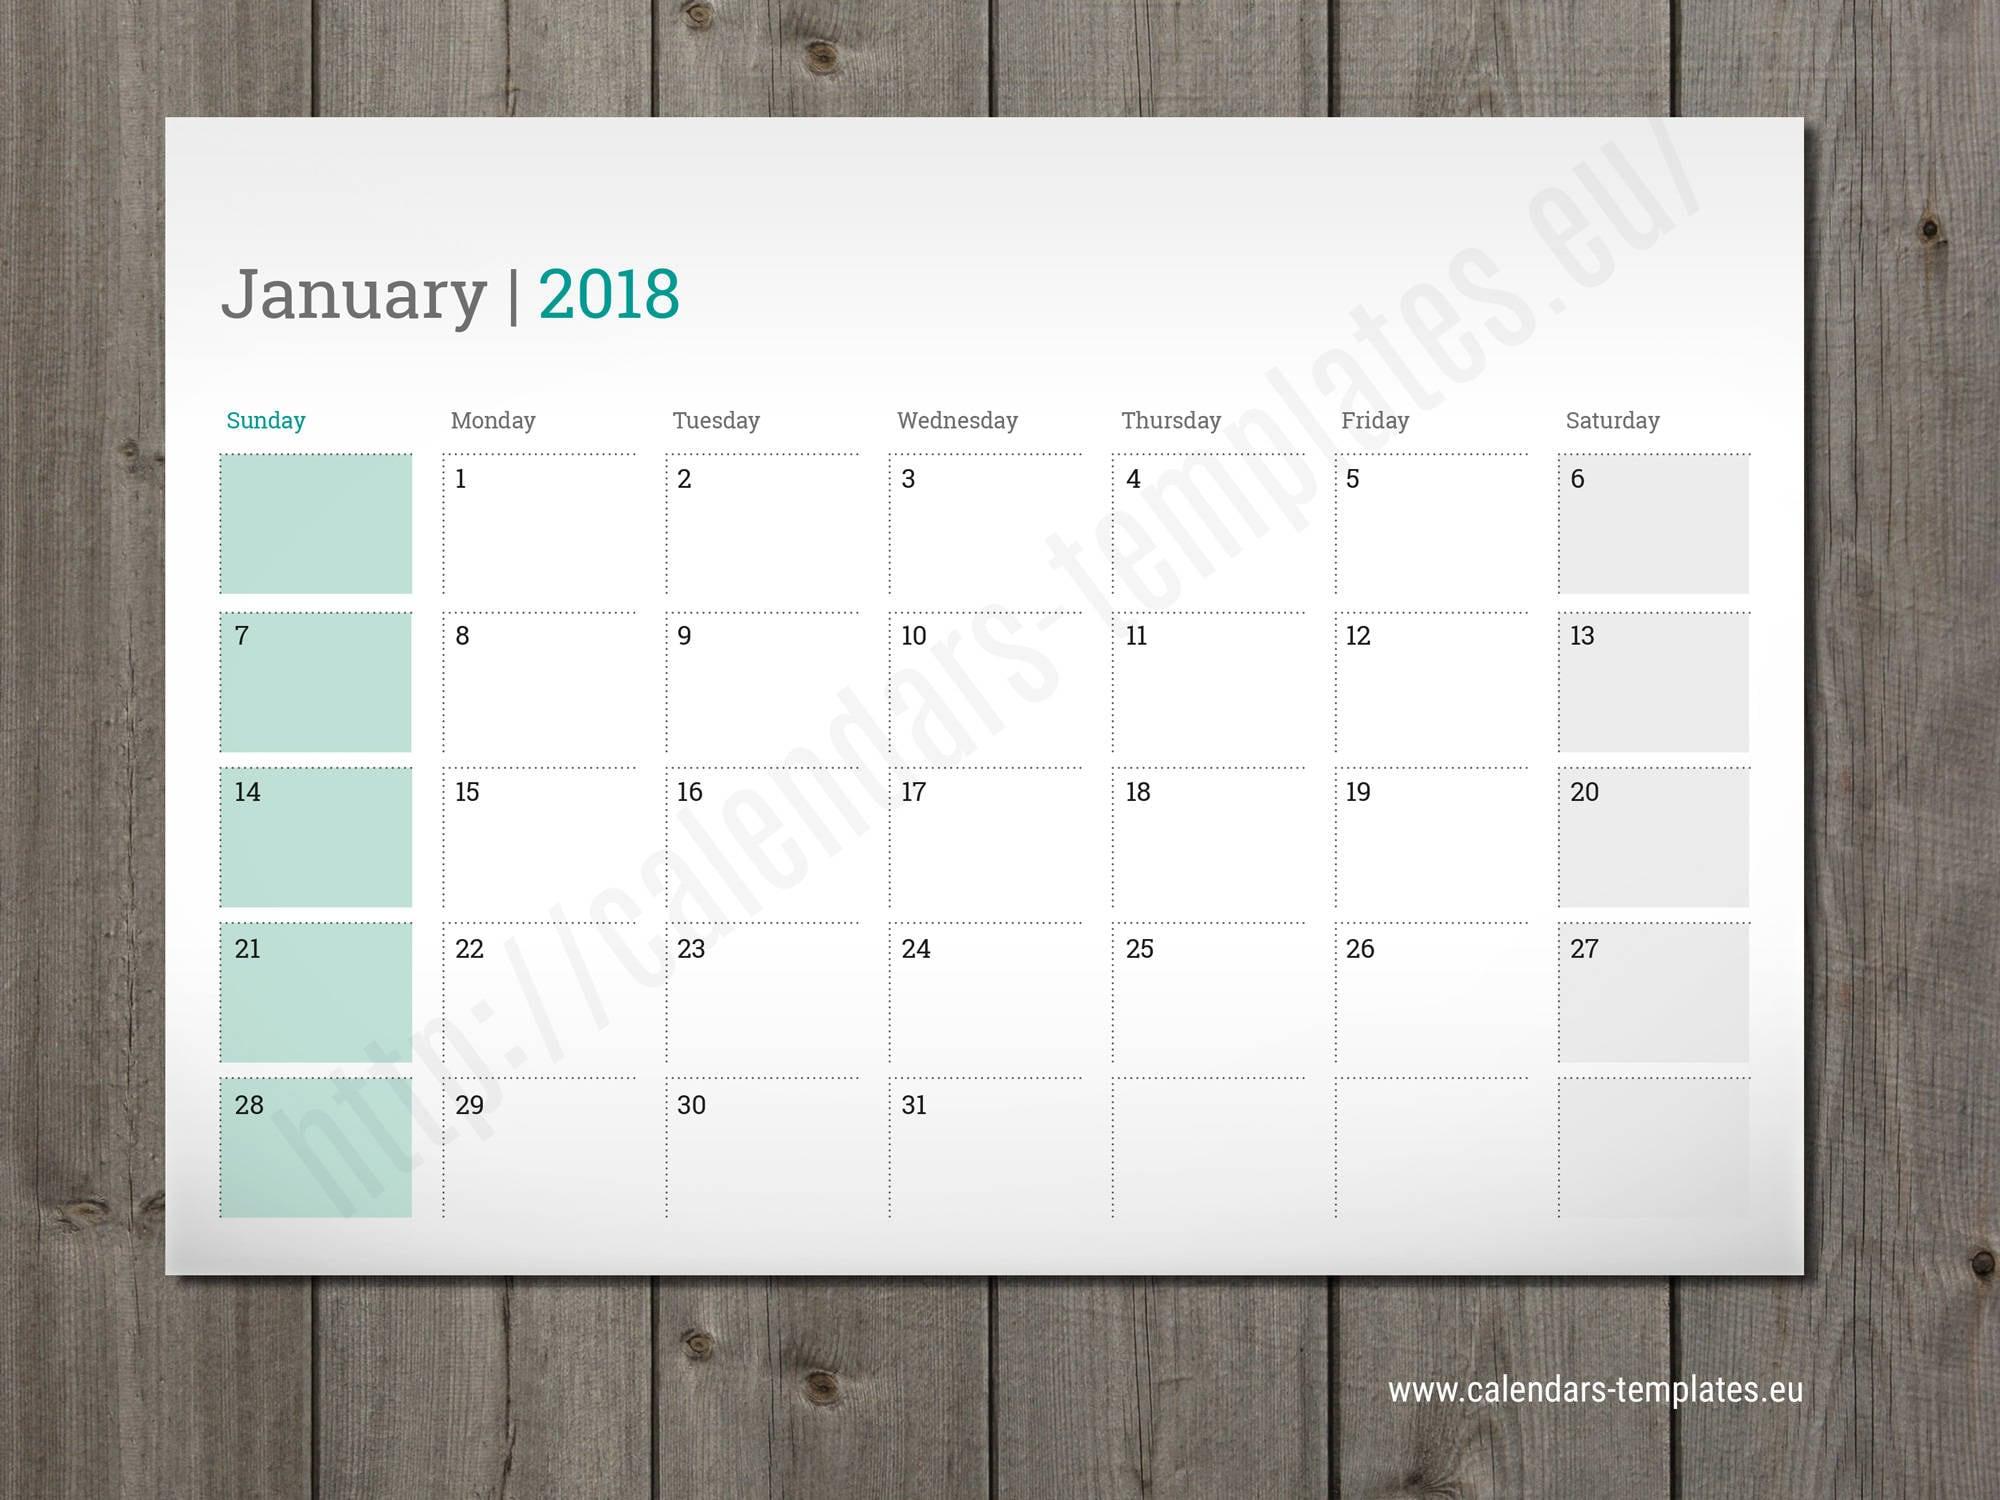 Weekly Calendar Indesign Template : Monthly wall or desk planner agenda template calendar